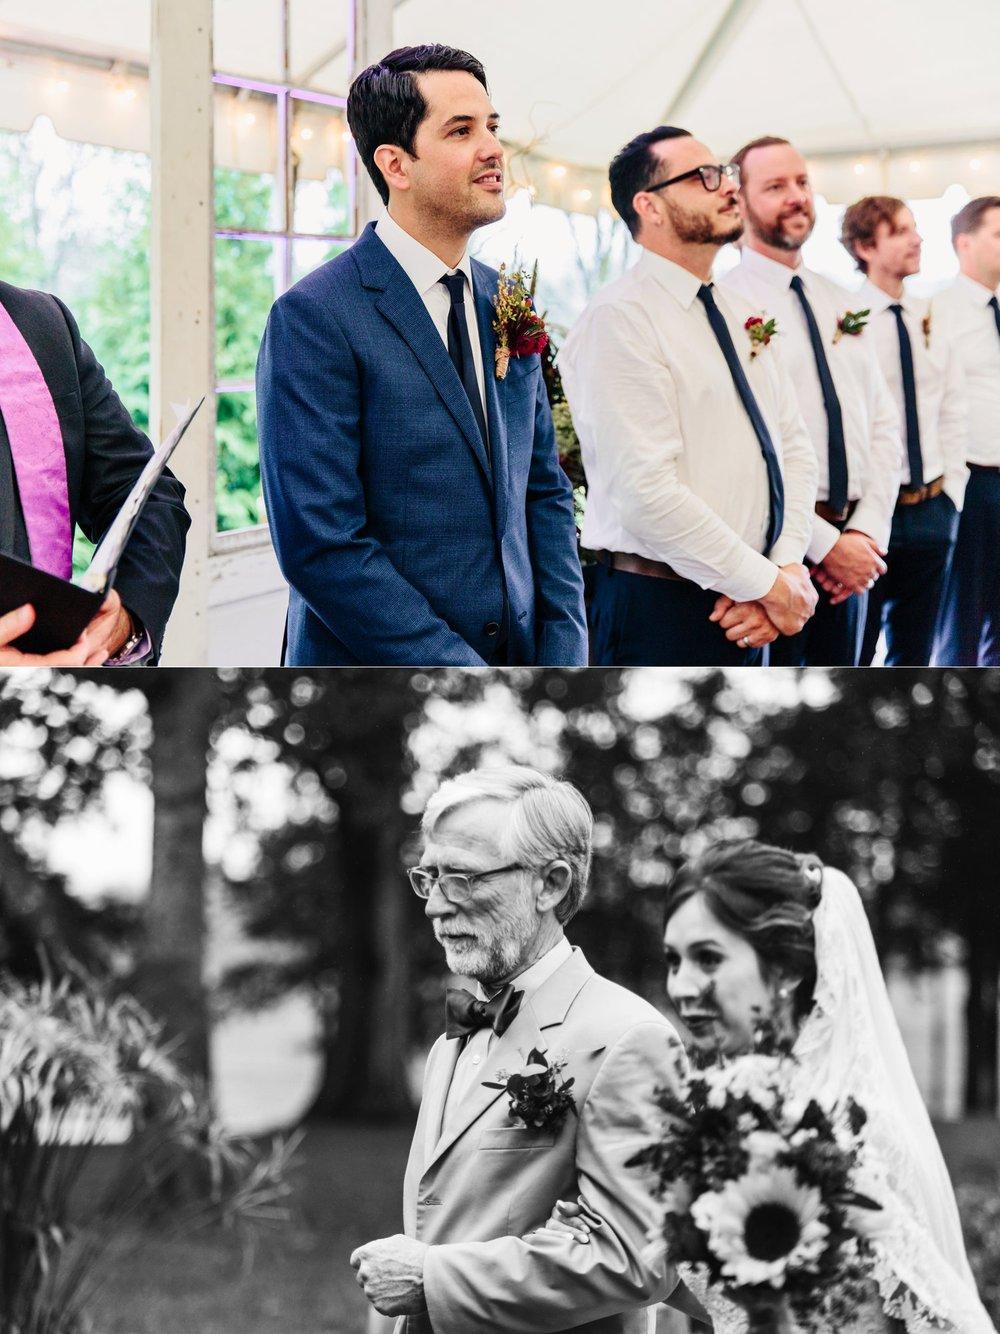 CK-Photo-arrington-wedding_0014.jpg